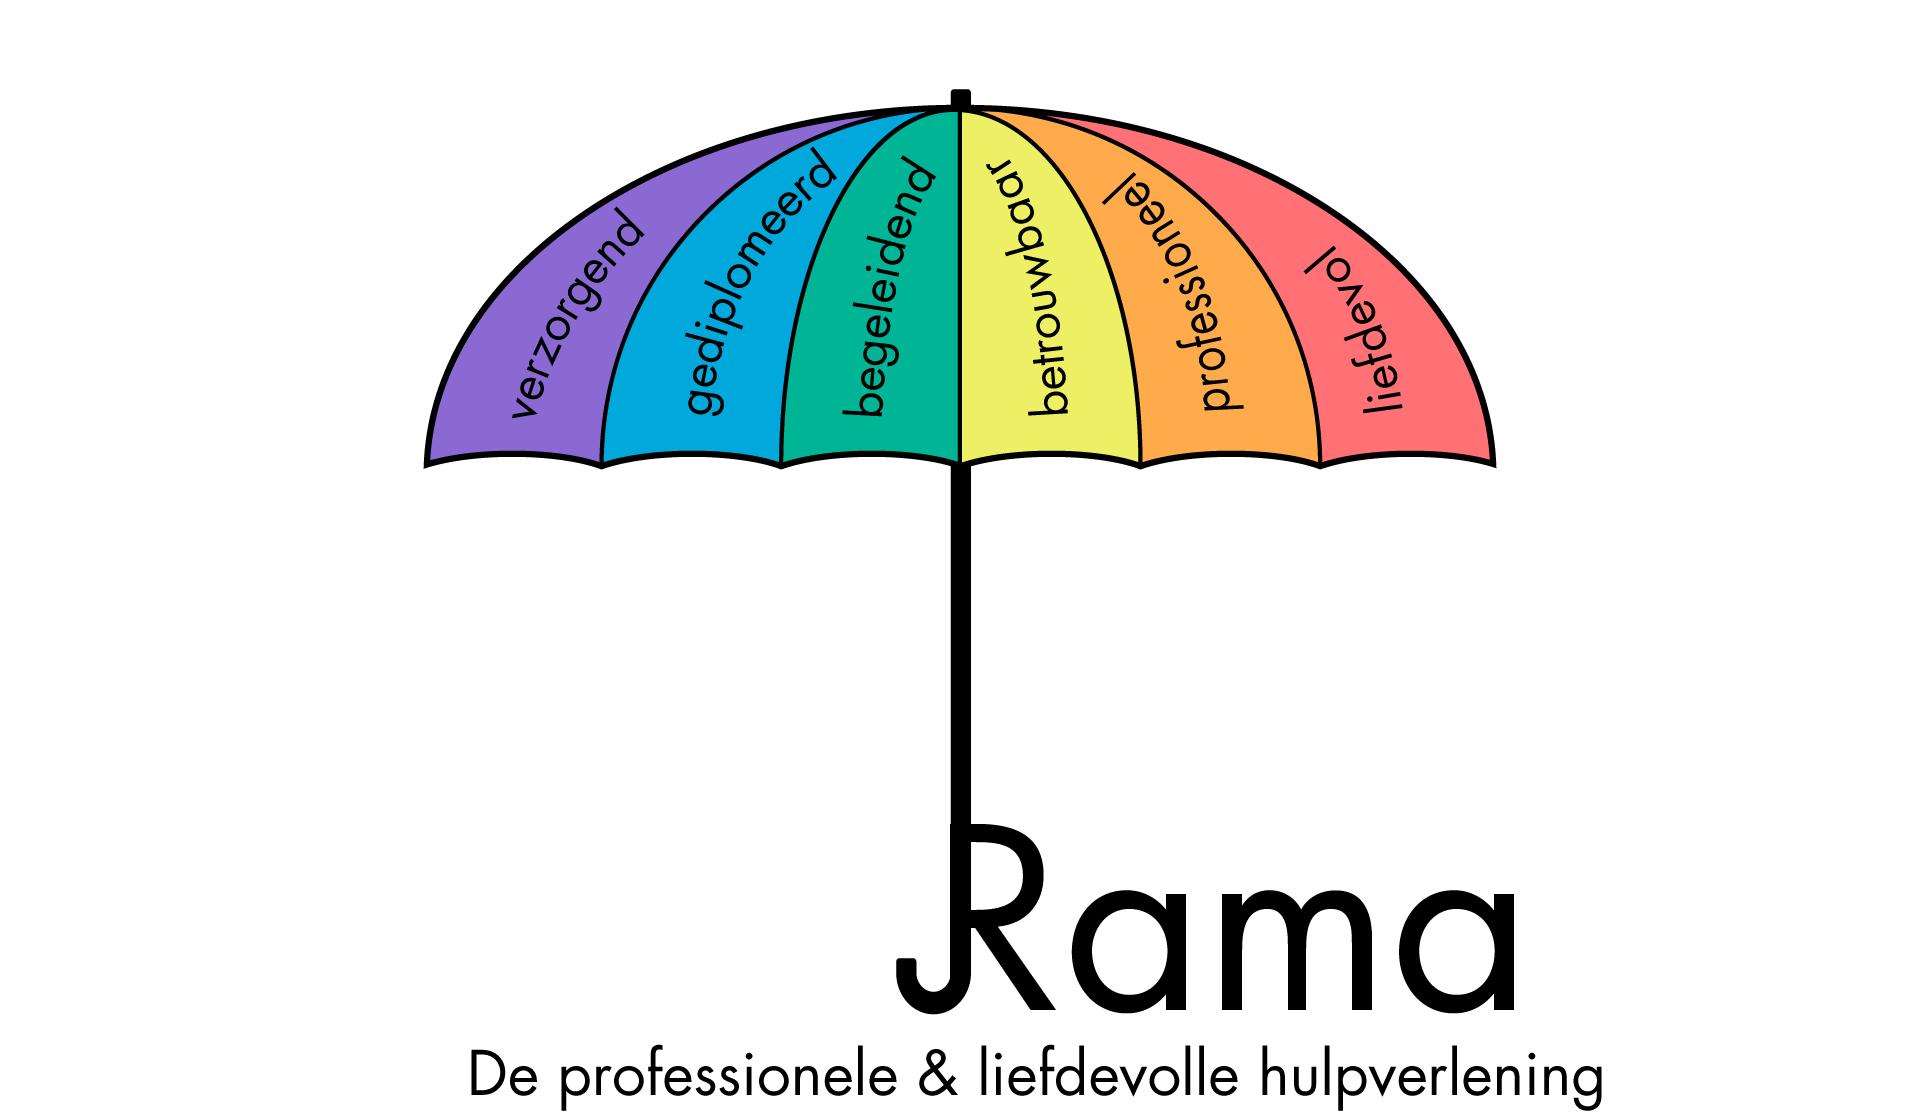 Rama Hulpverlening